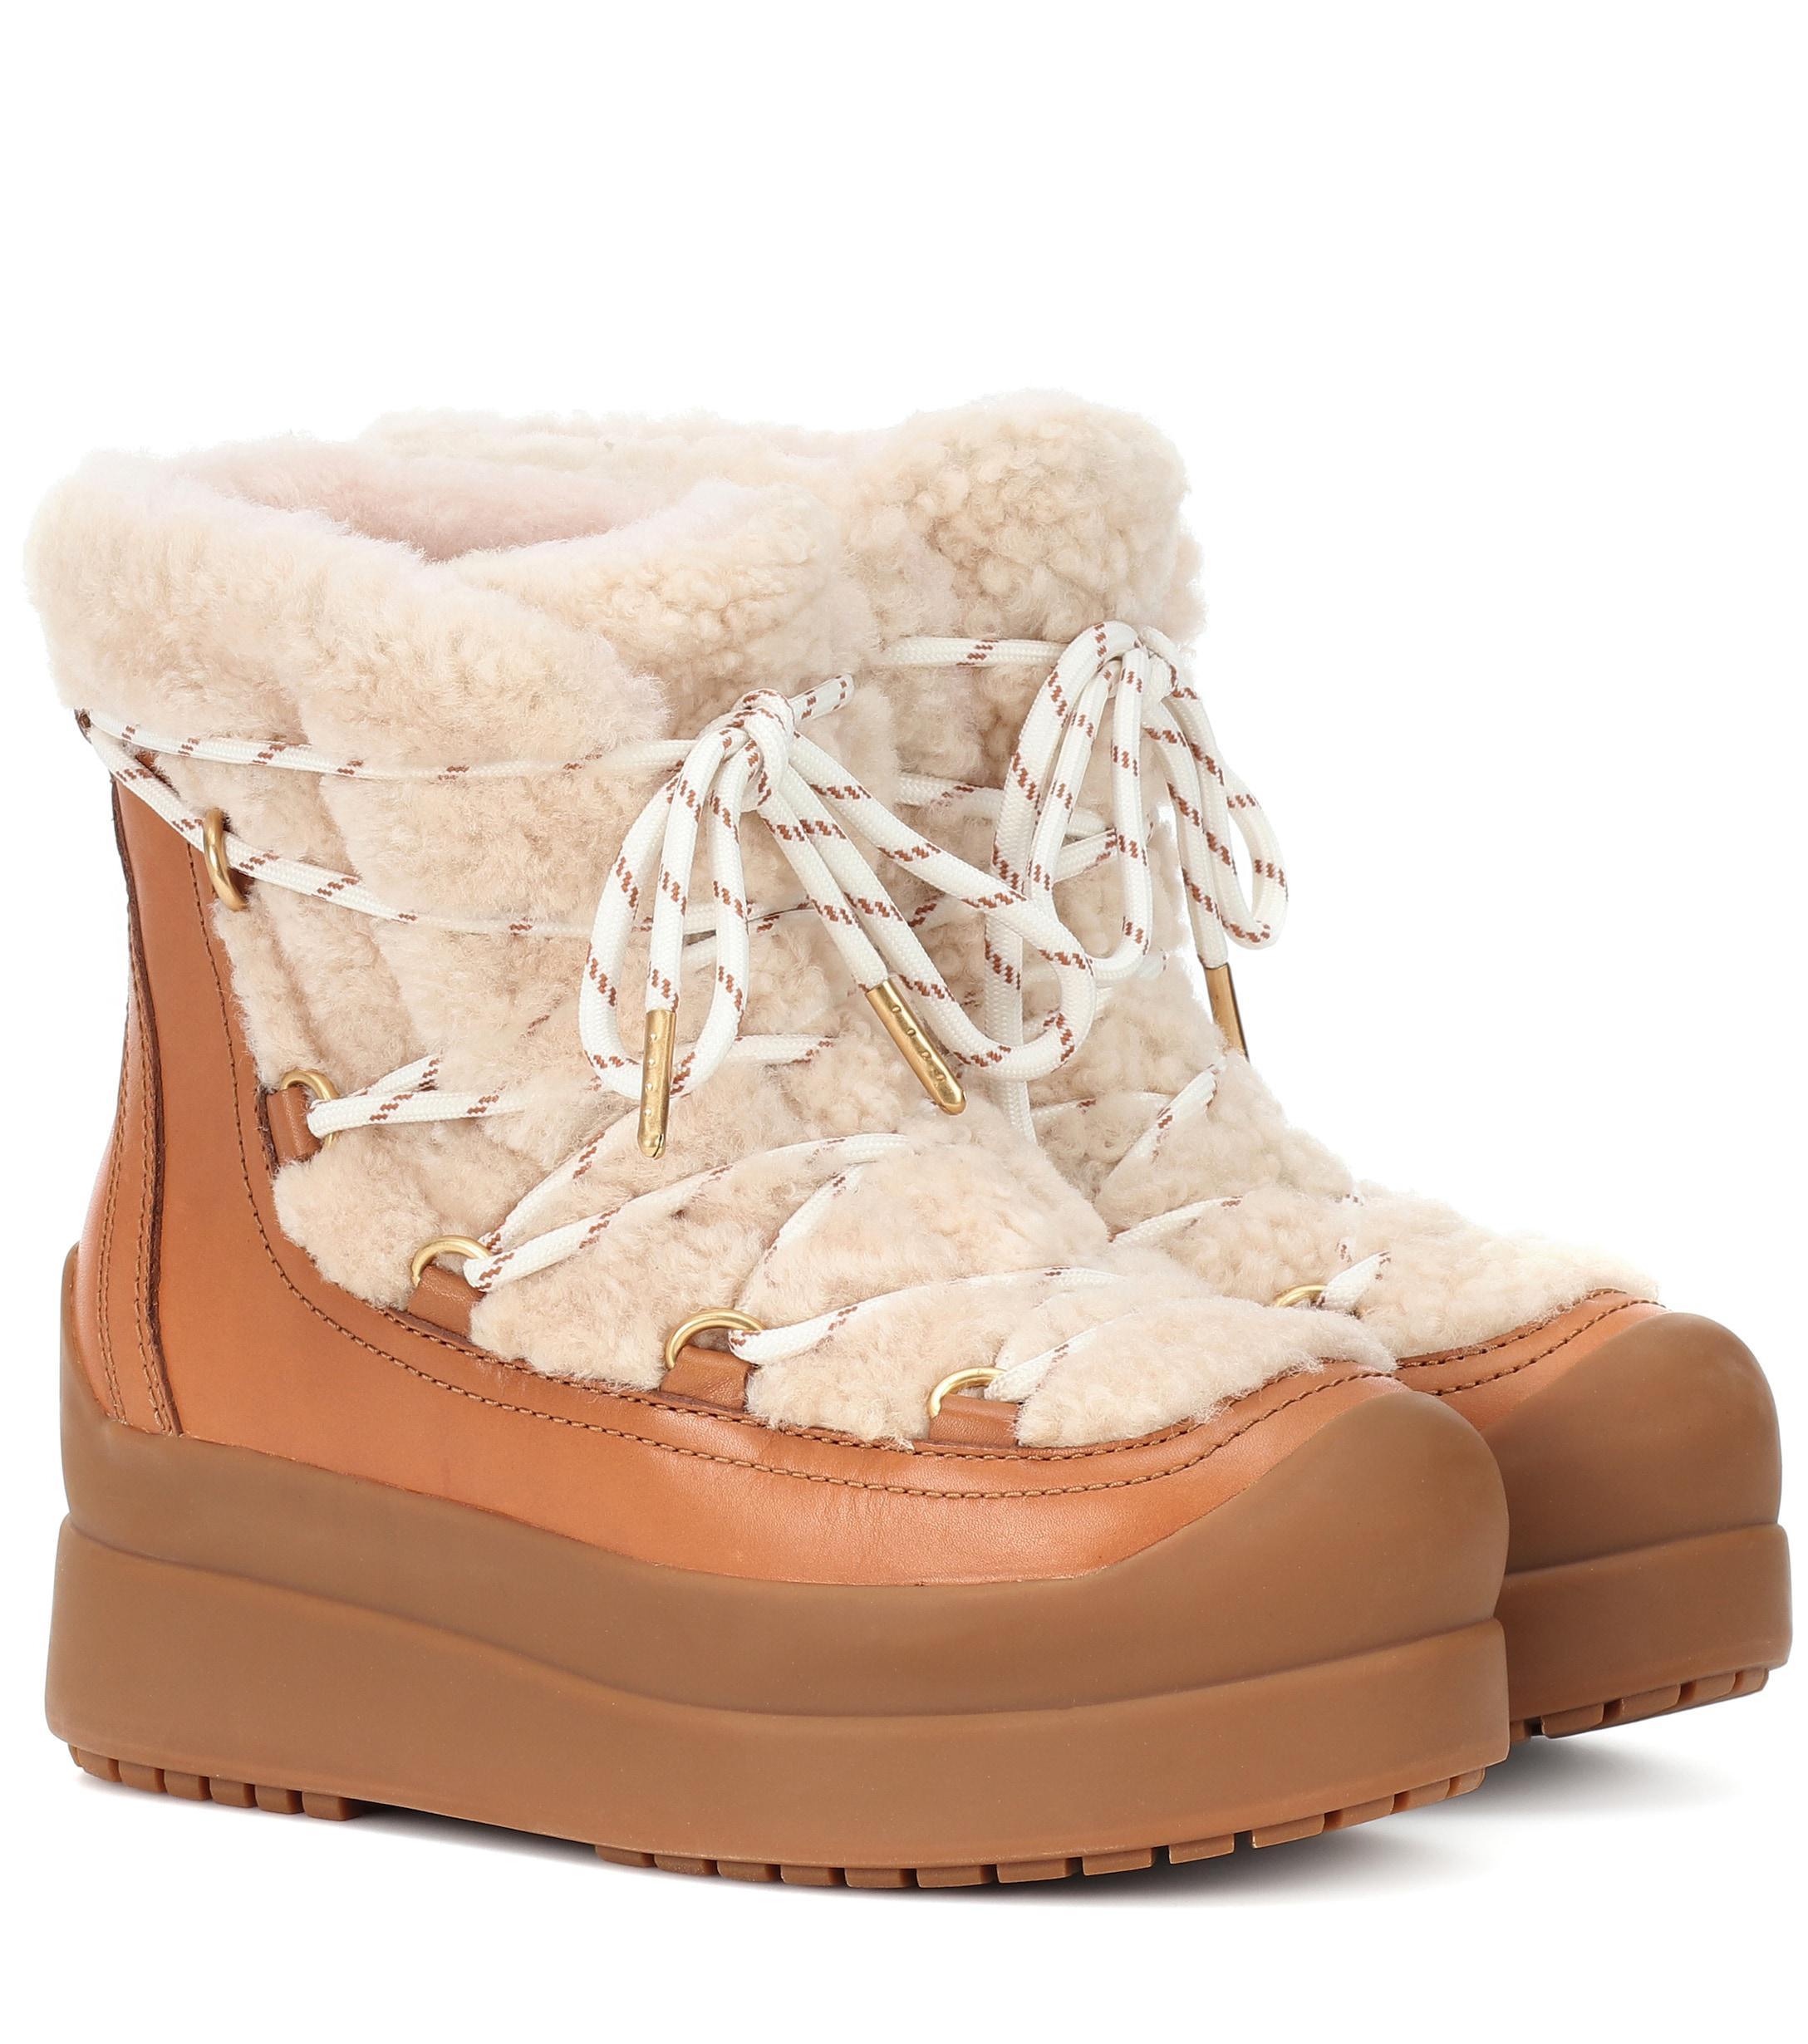 9da613b20 Tory Burch. Women s Courtney 60mm Shearling Ankle Boots